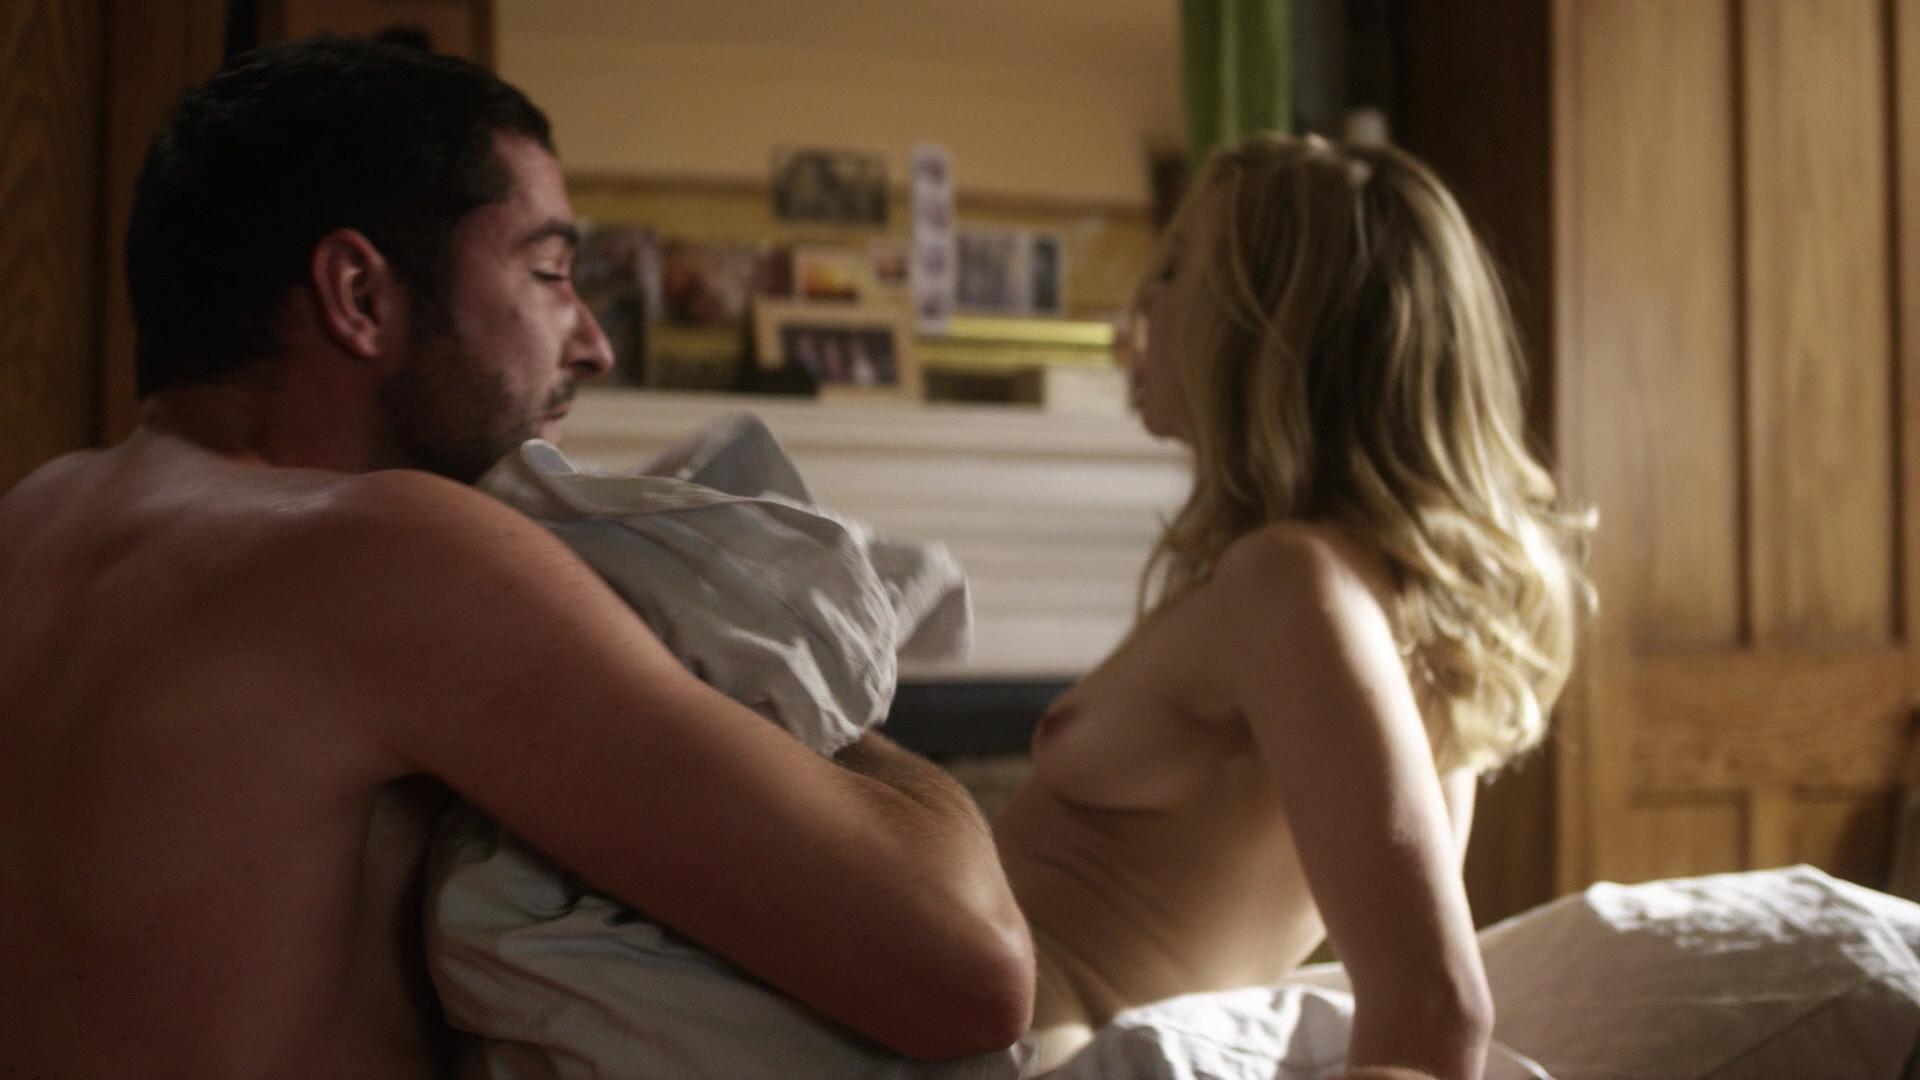 Natalie Dormer boobs showing